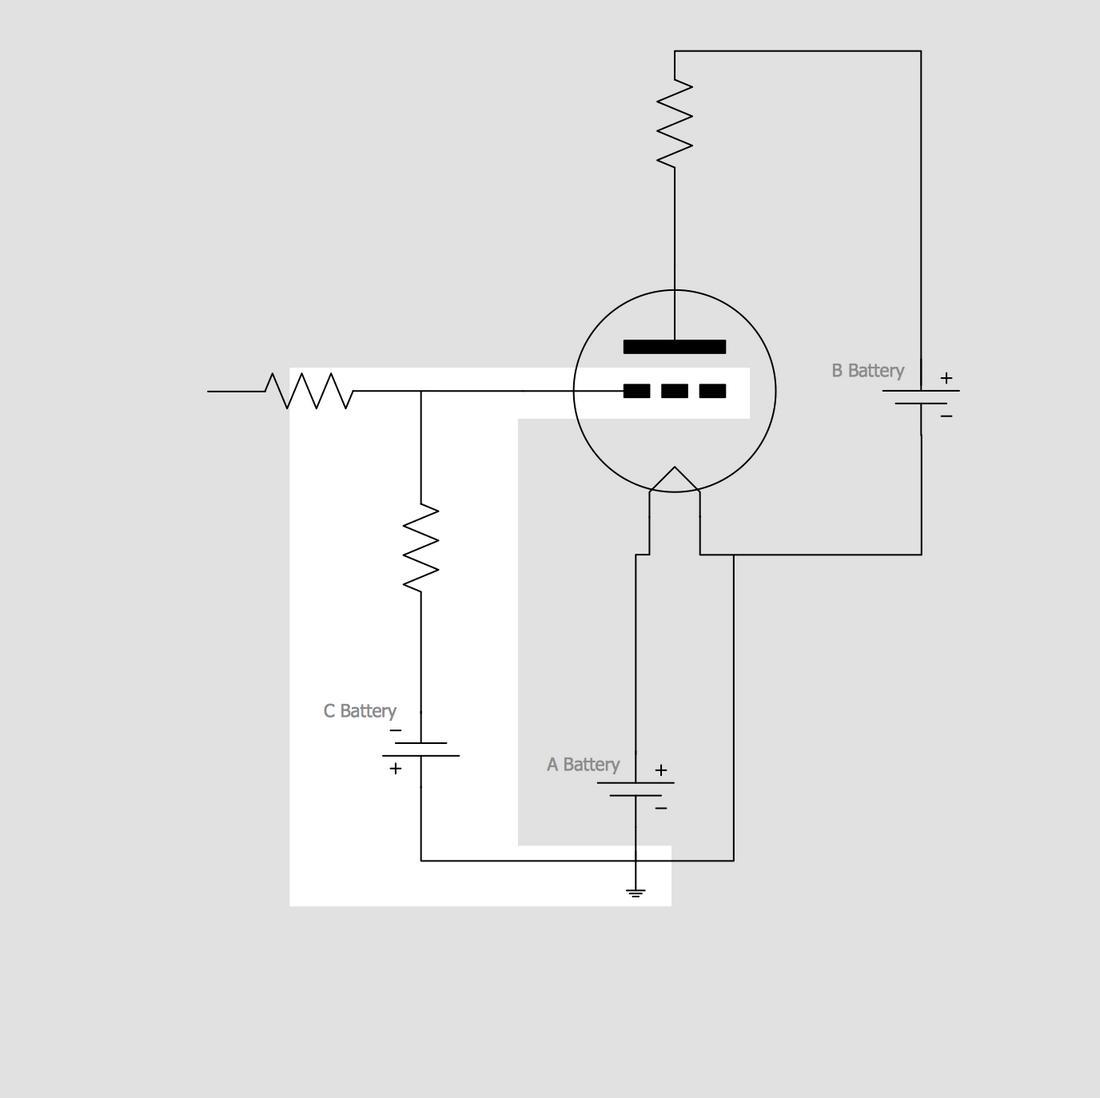 Electrical Circuits Diagram